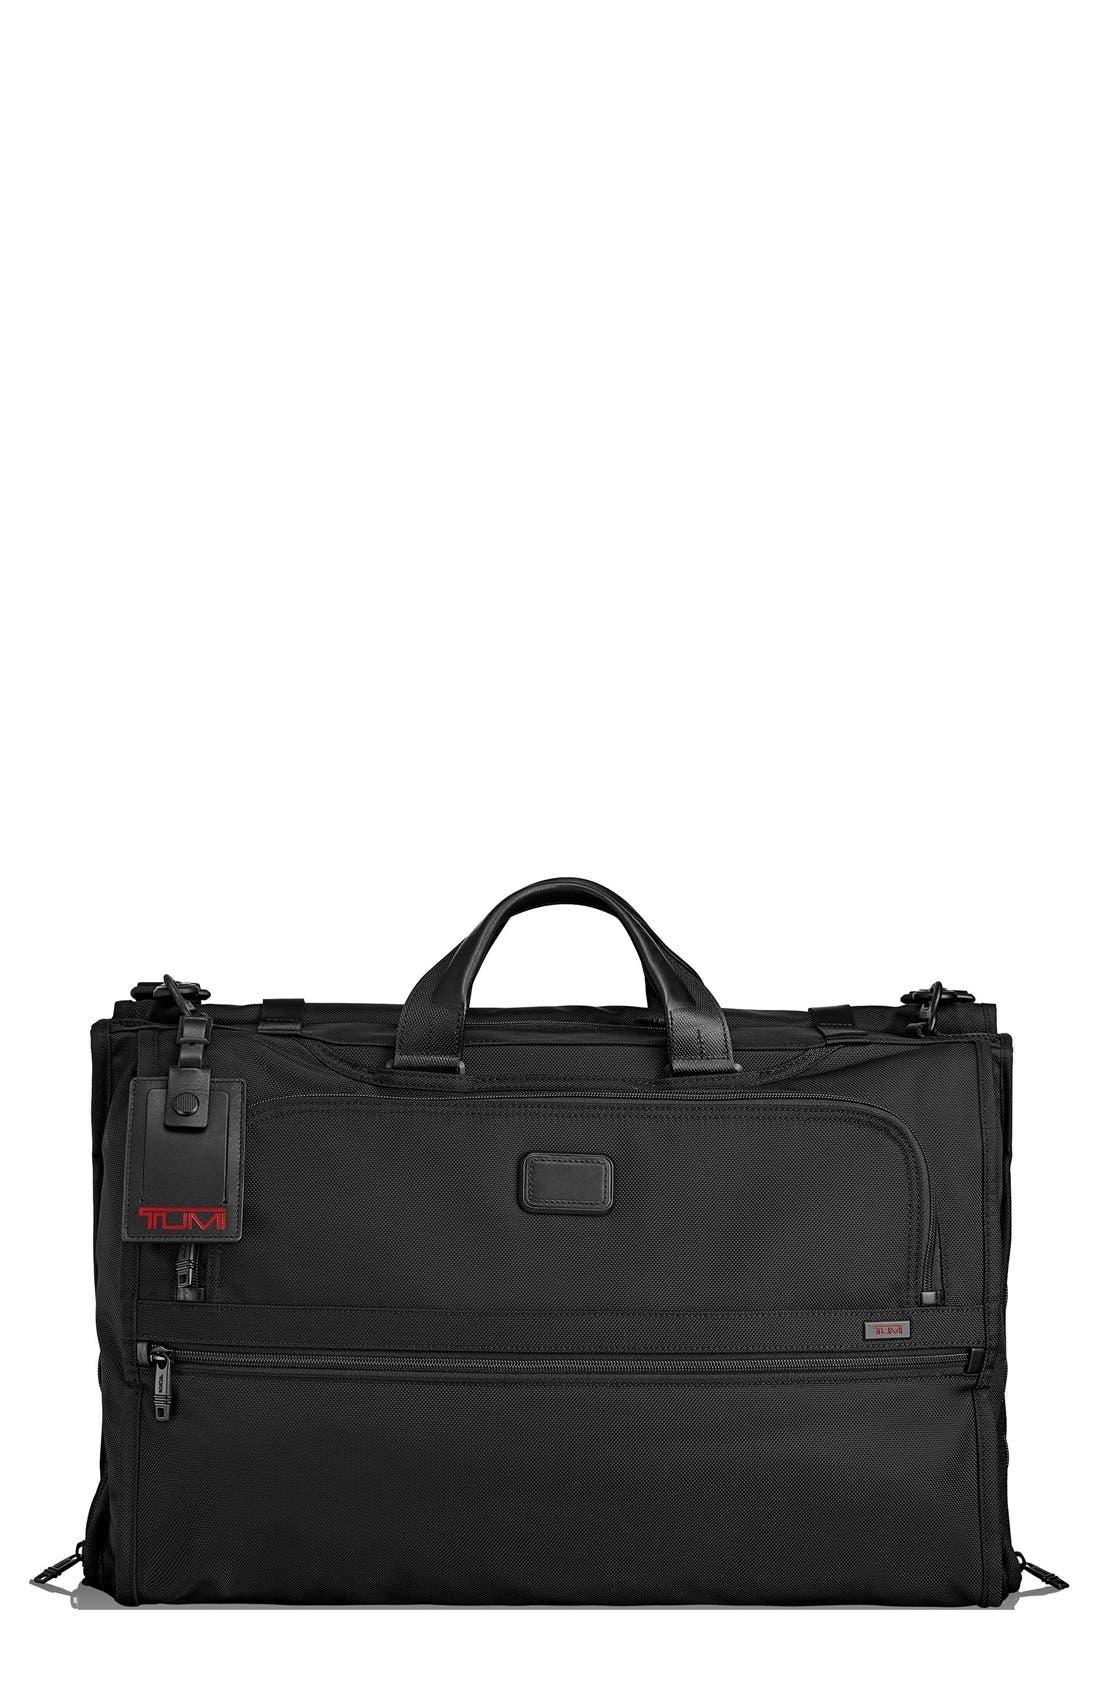 Alpha 2 22-Inch Trifold Carry-On Garment Bag,                             Main thumbnail 1, color,                             BLACK